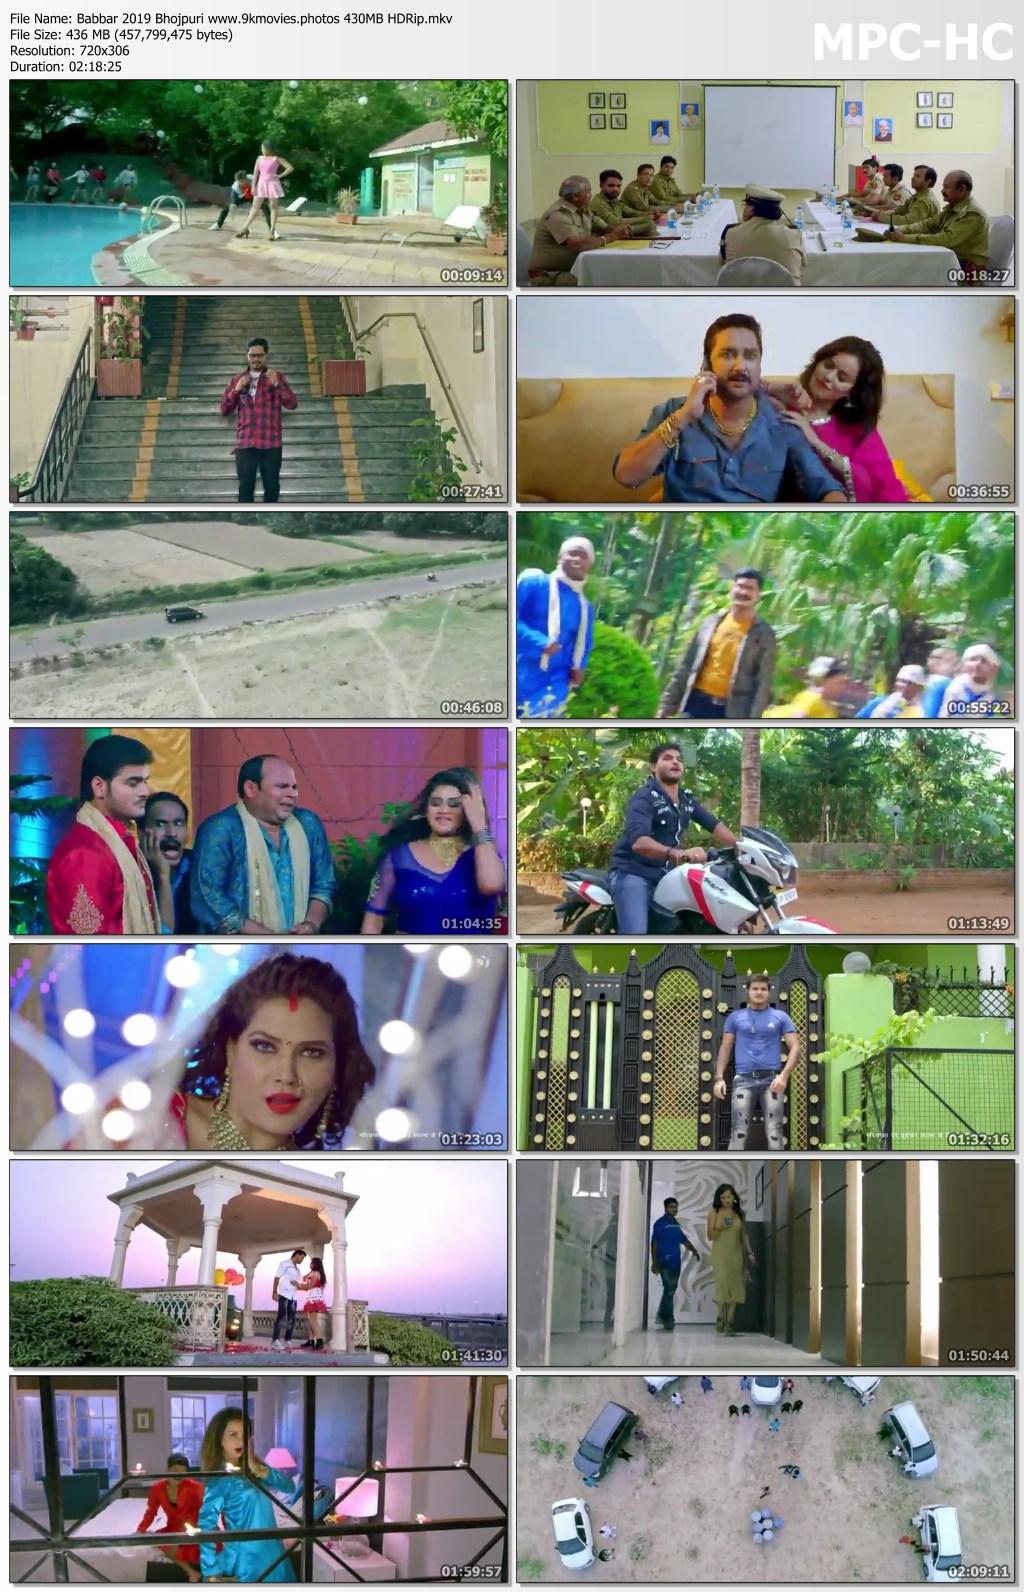 Babbar 2019 Bhojpuri 435MB HDRip Download